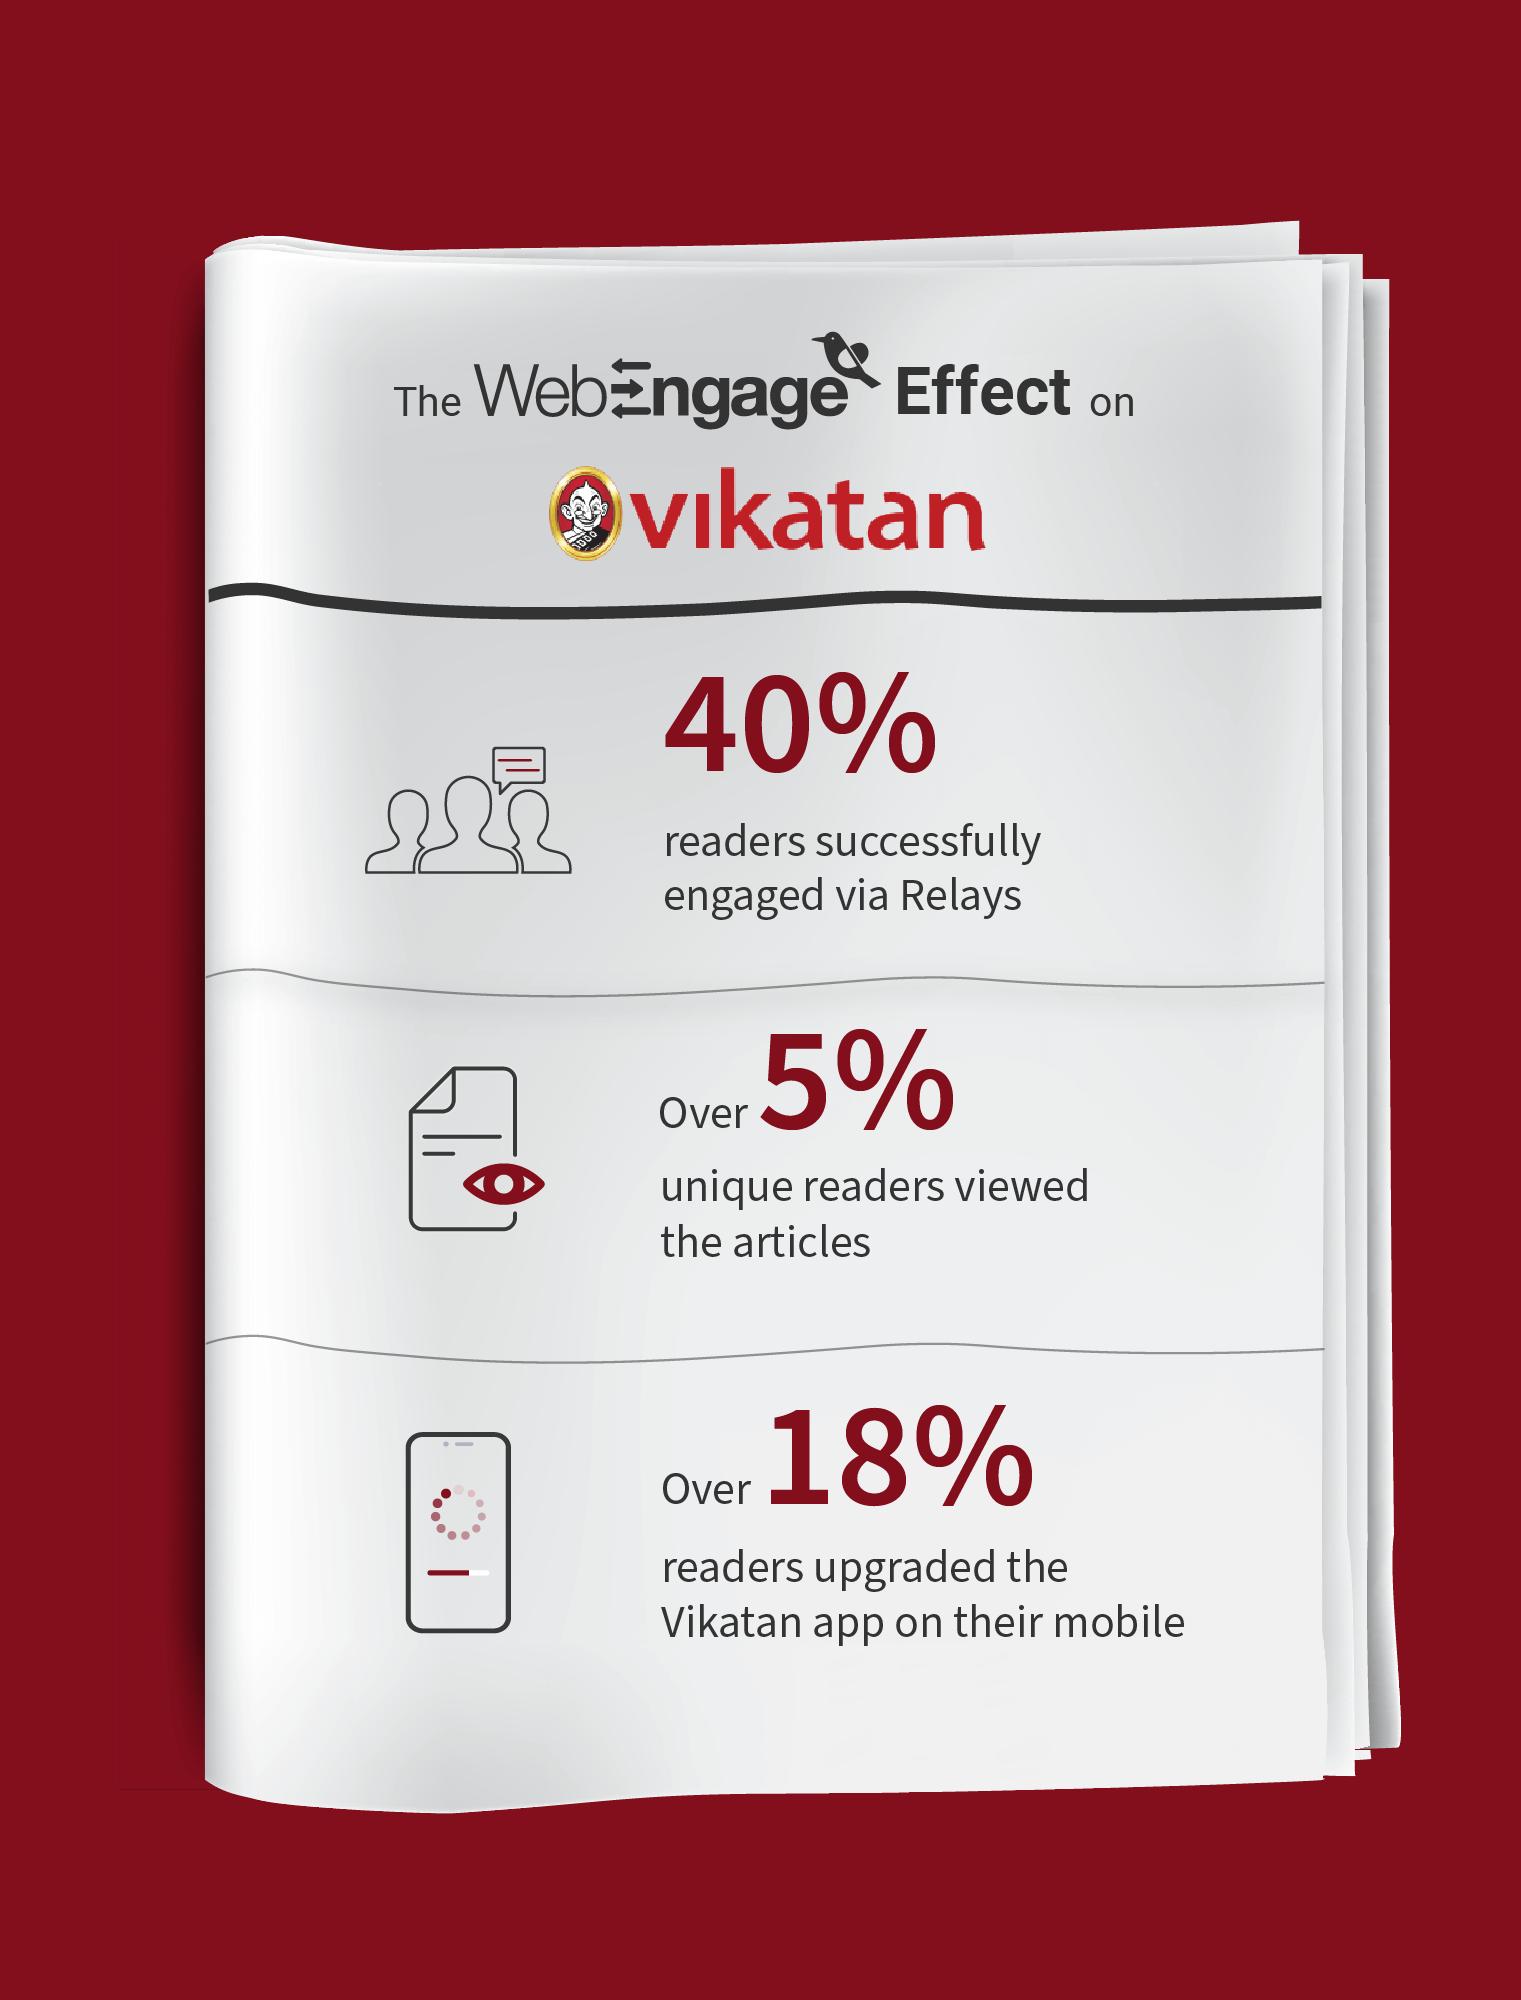 The WebEngage Effect on Vikatan